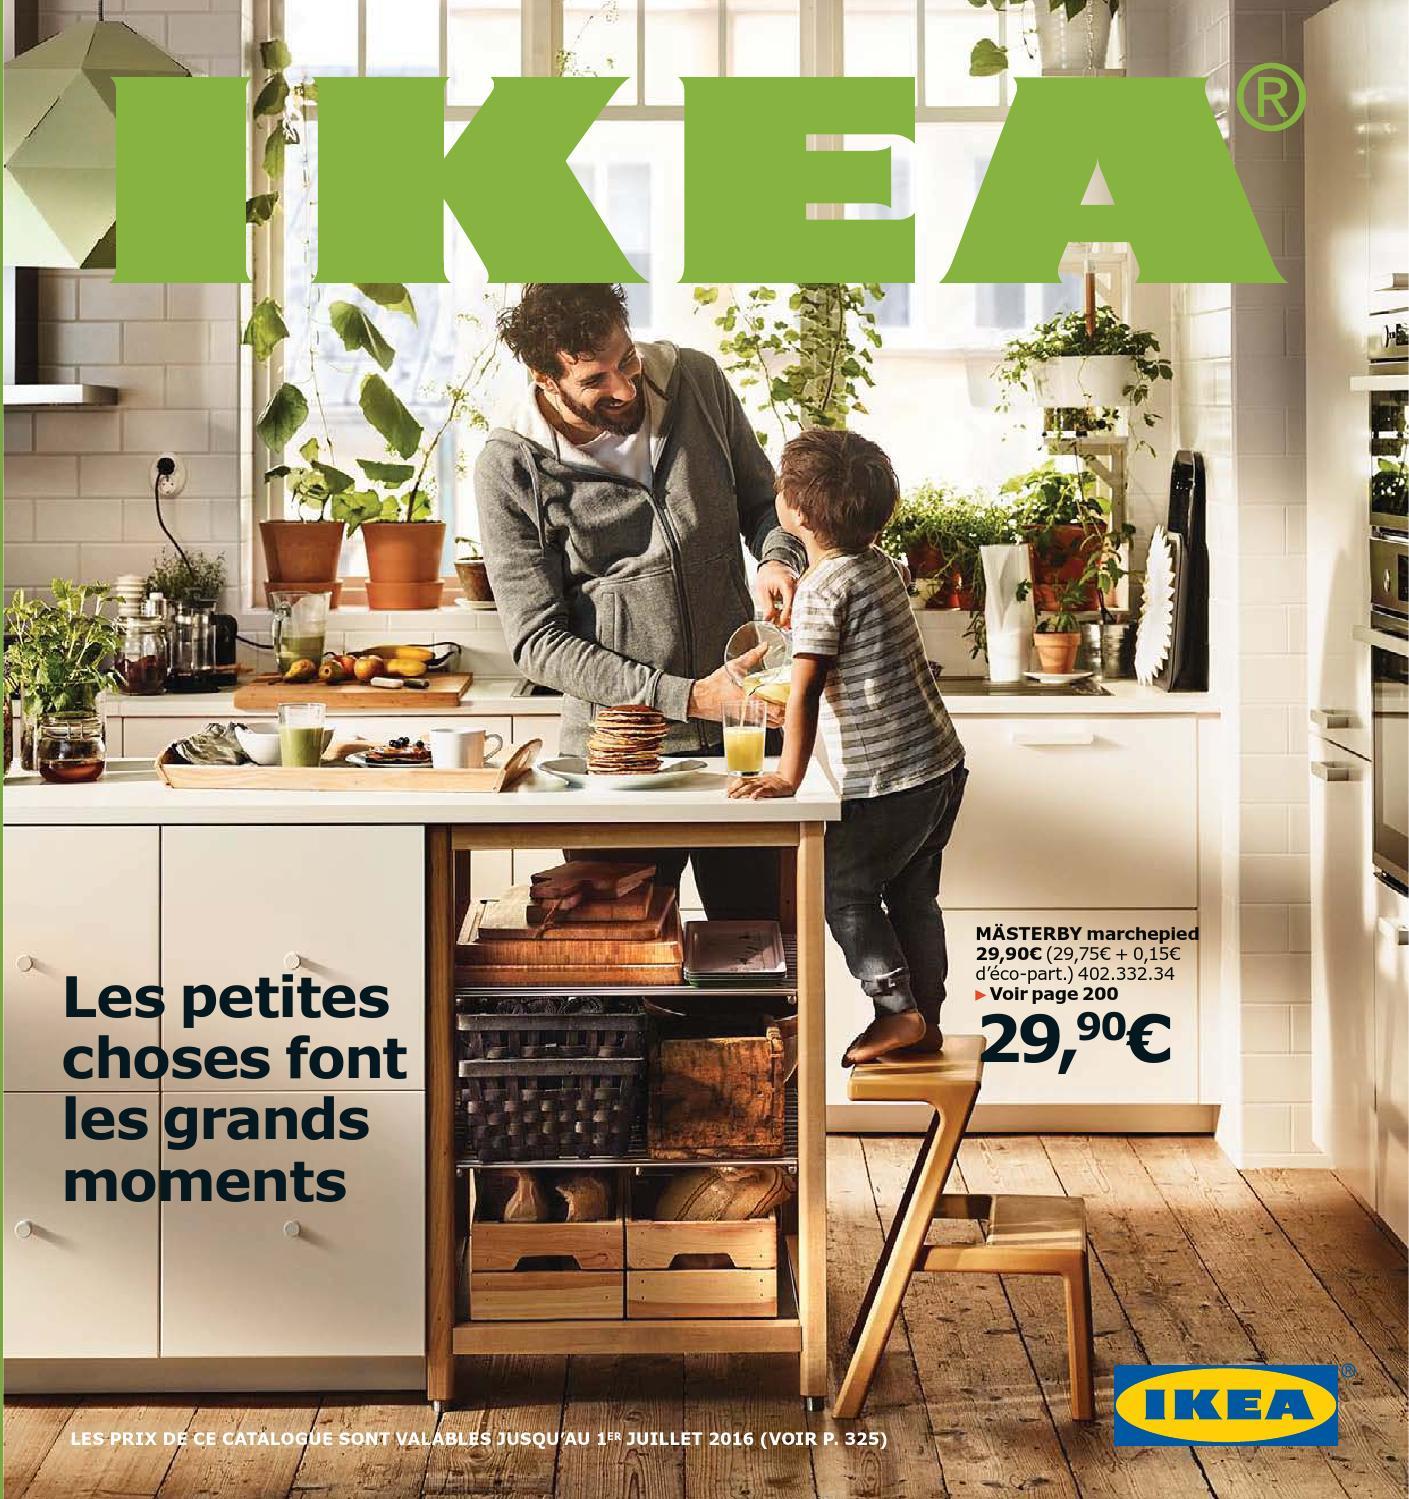 Housse Canape Ikea Ancien Modele Nouveau Photos Ikea Catalogue 2016 by Margot Ziegler issuu